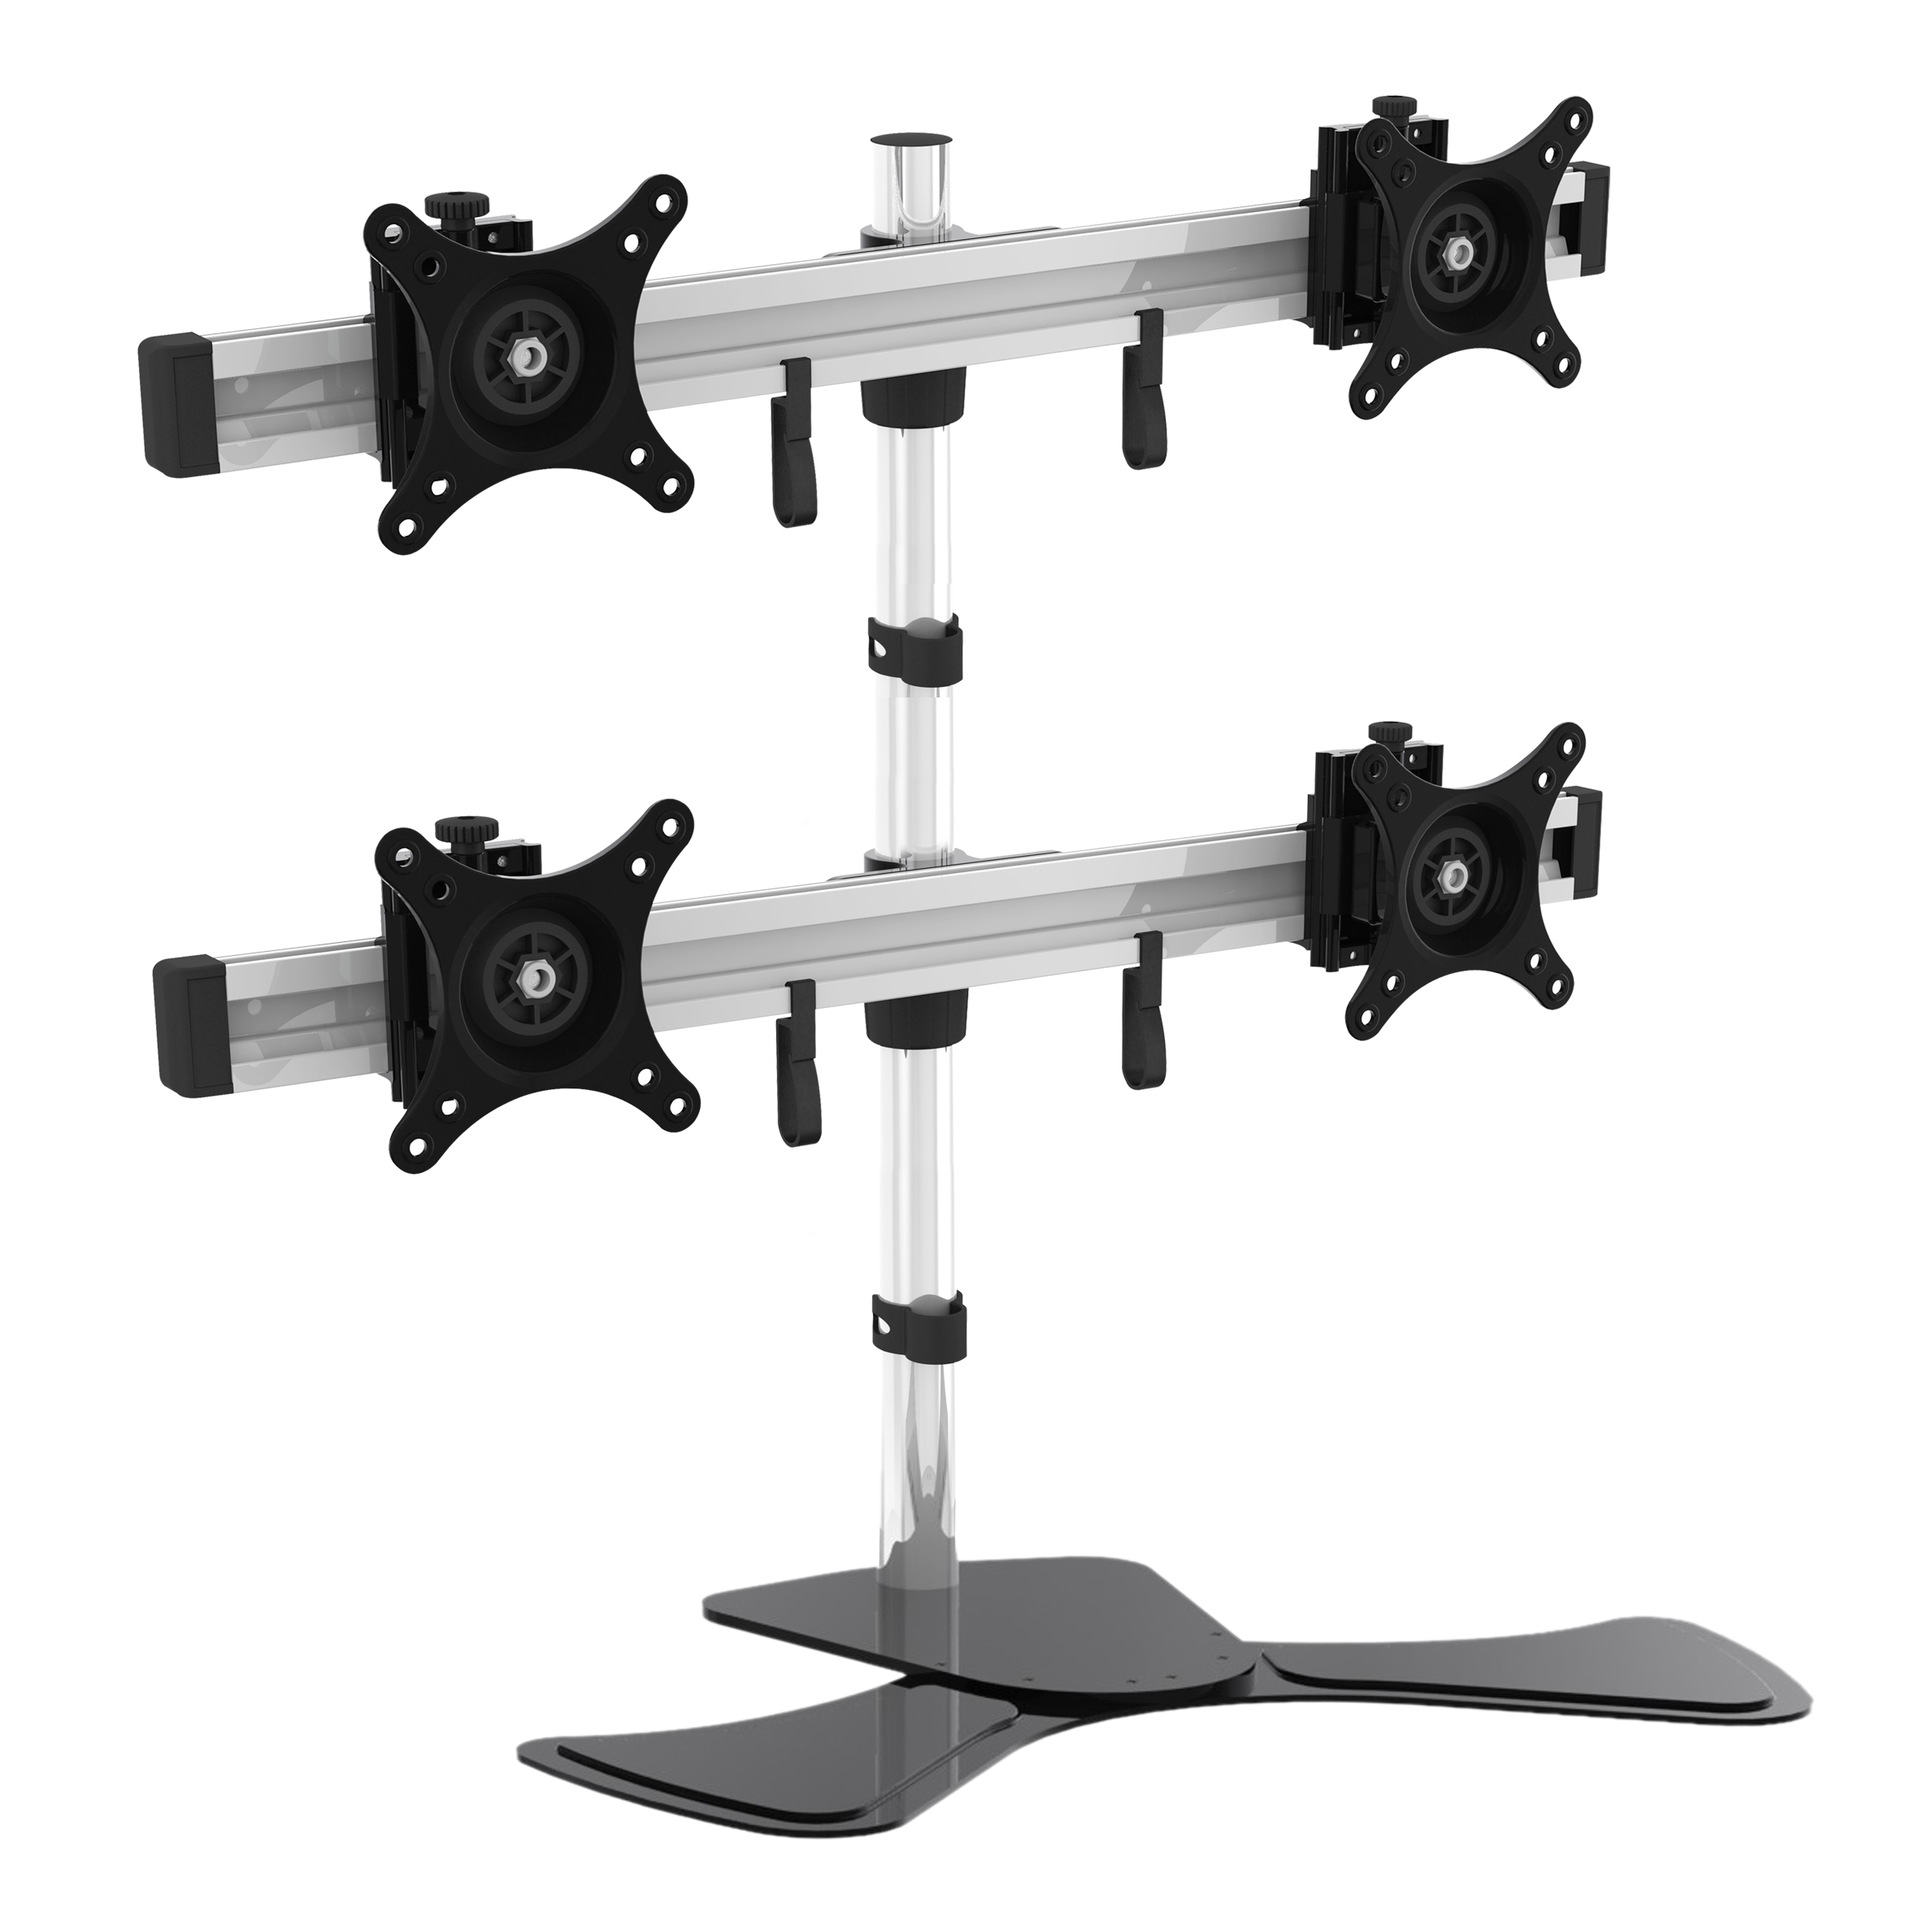 quad monitor stand desktop rotating lift lcd computer monitor screen than three support pylons holder rack bracket